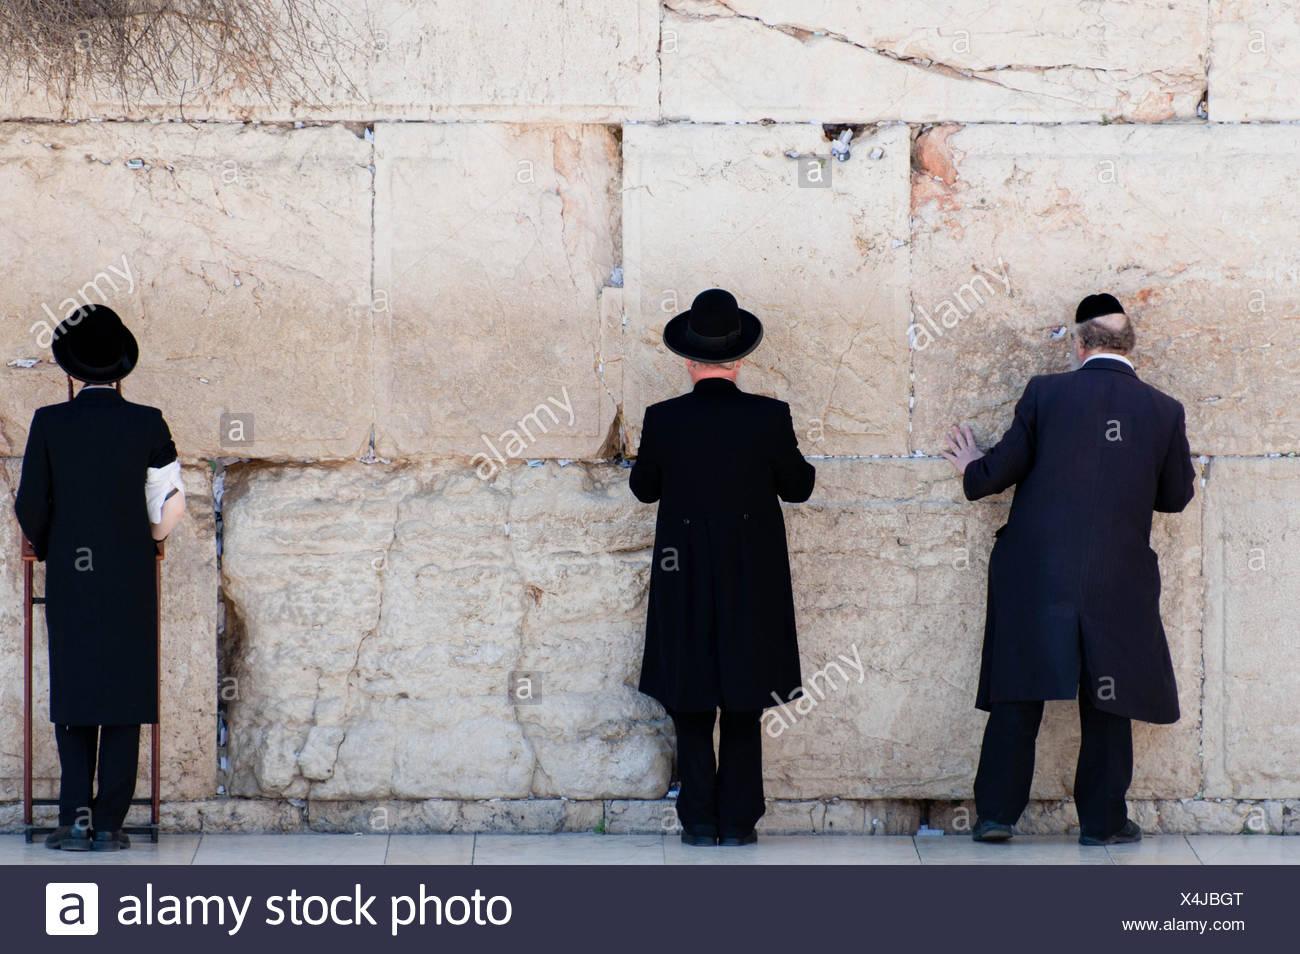 Orthodox Jewish Men Praying At The Wailing Wall - Stock Image